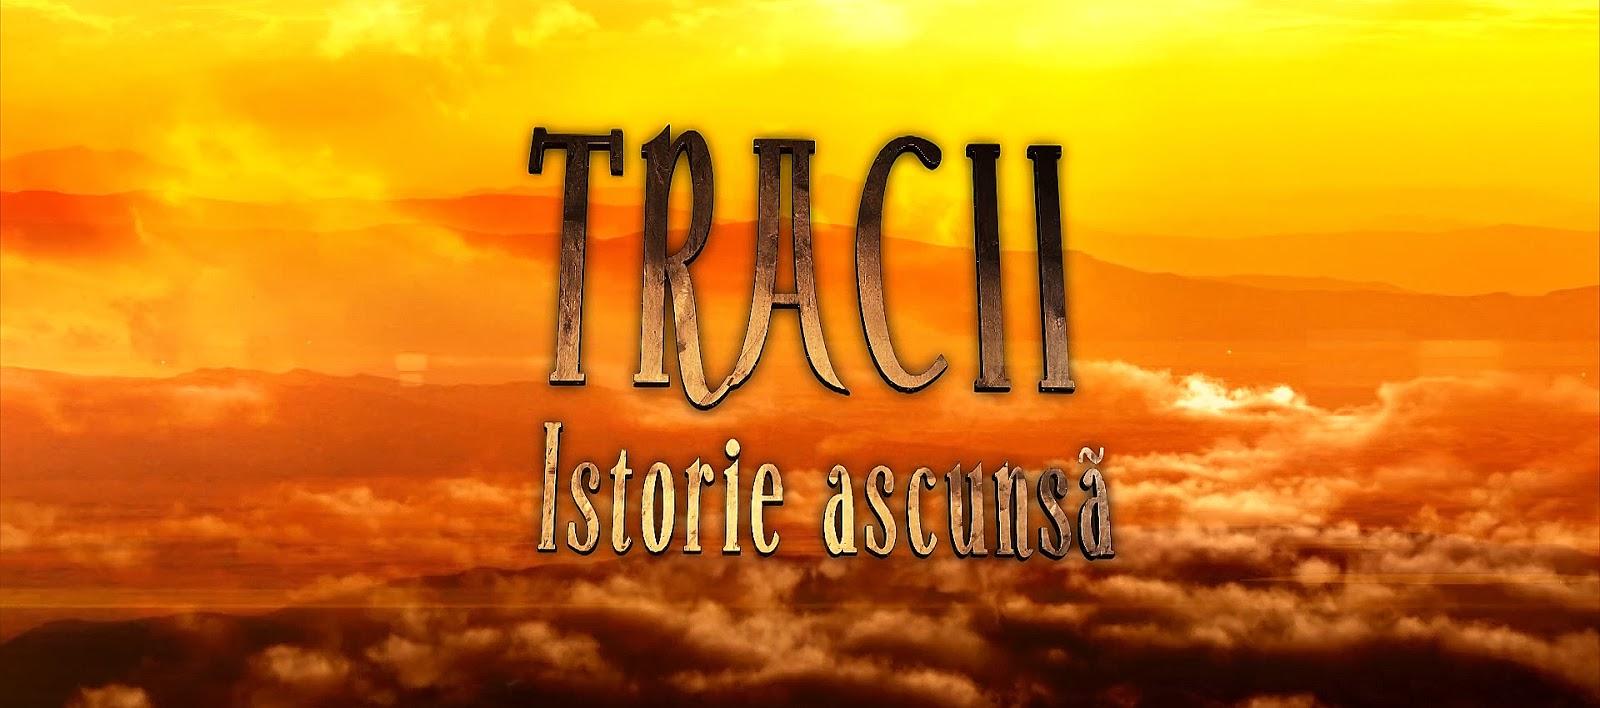 Tracii - cover image 2 simpla